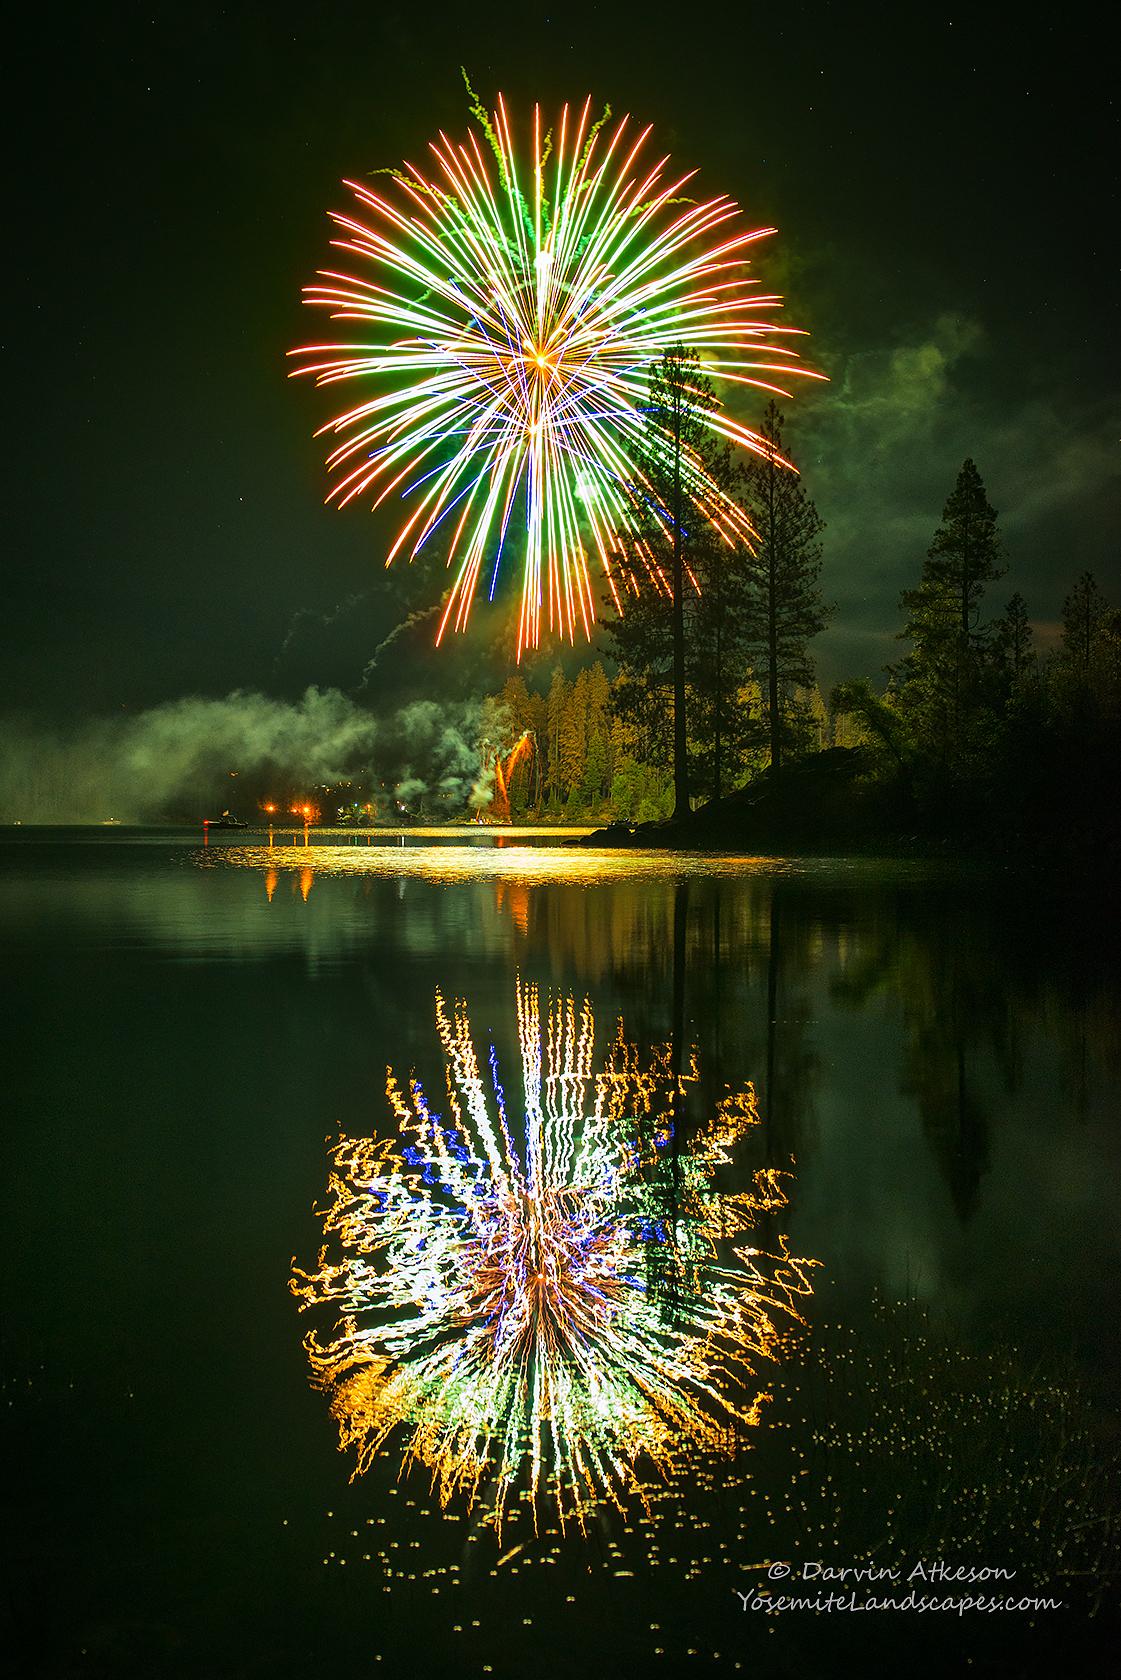 Add Fireworks!